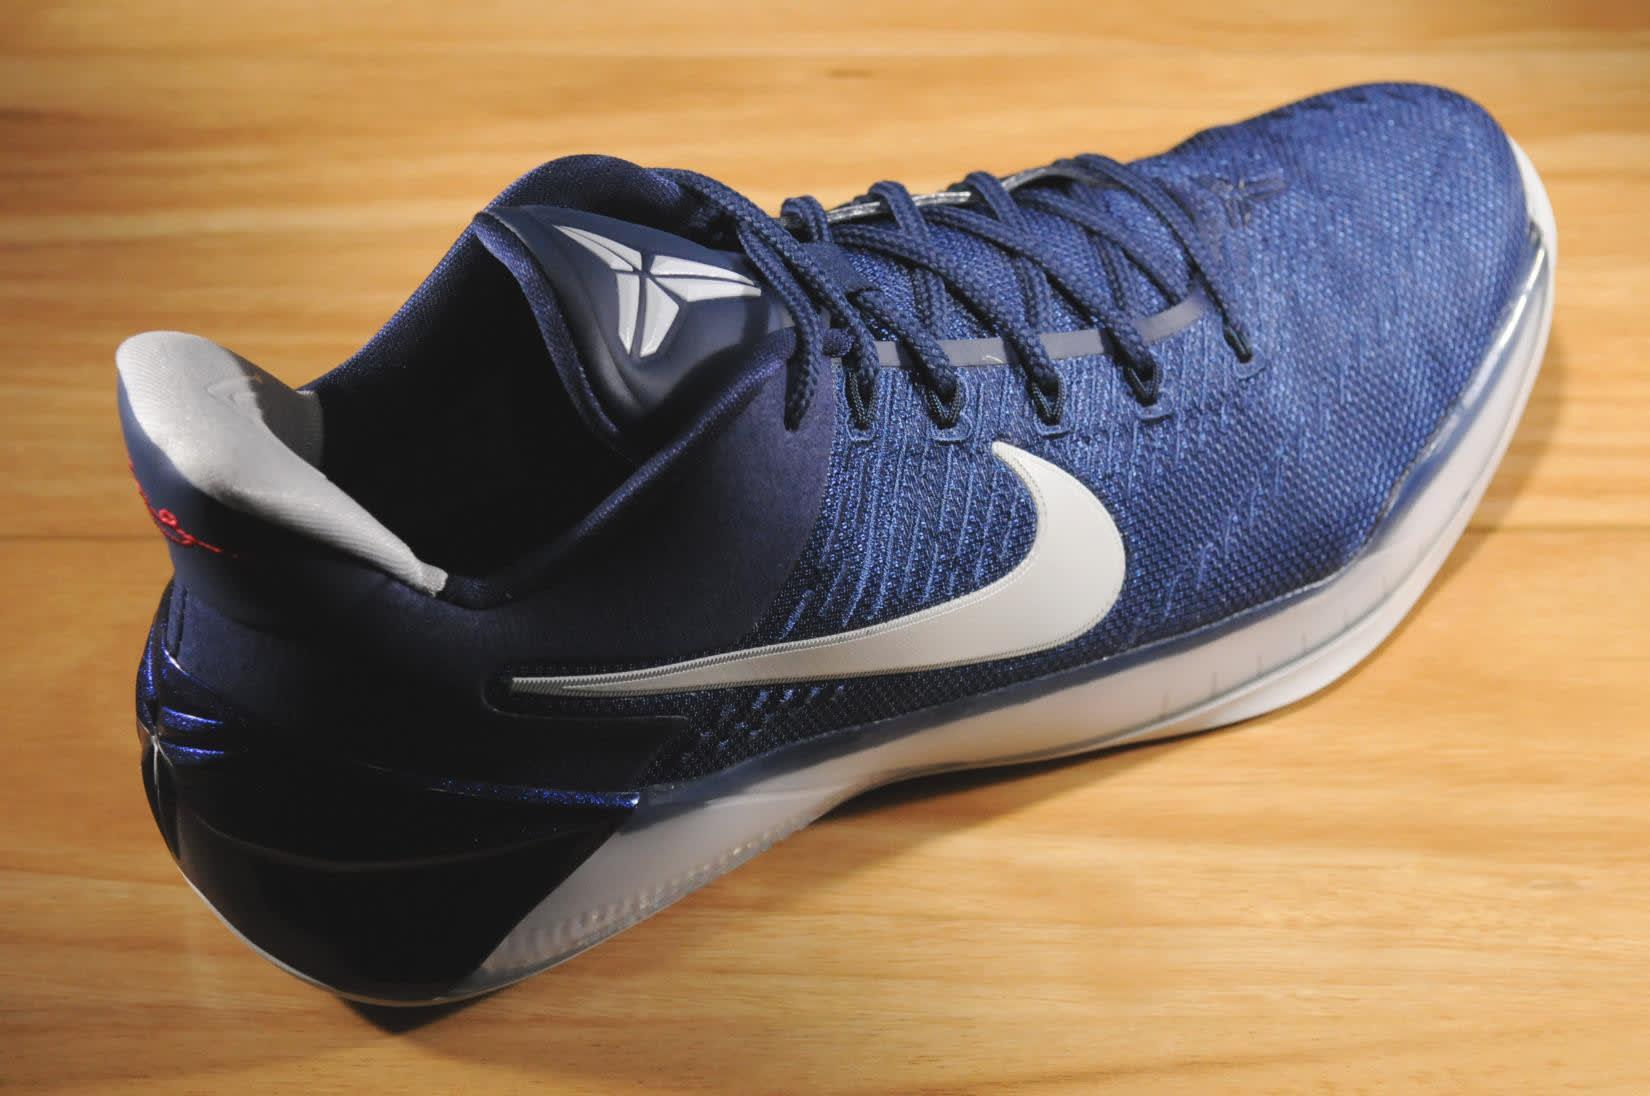 Nike Kobe AD Midnight Navy Heel 852425-406